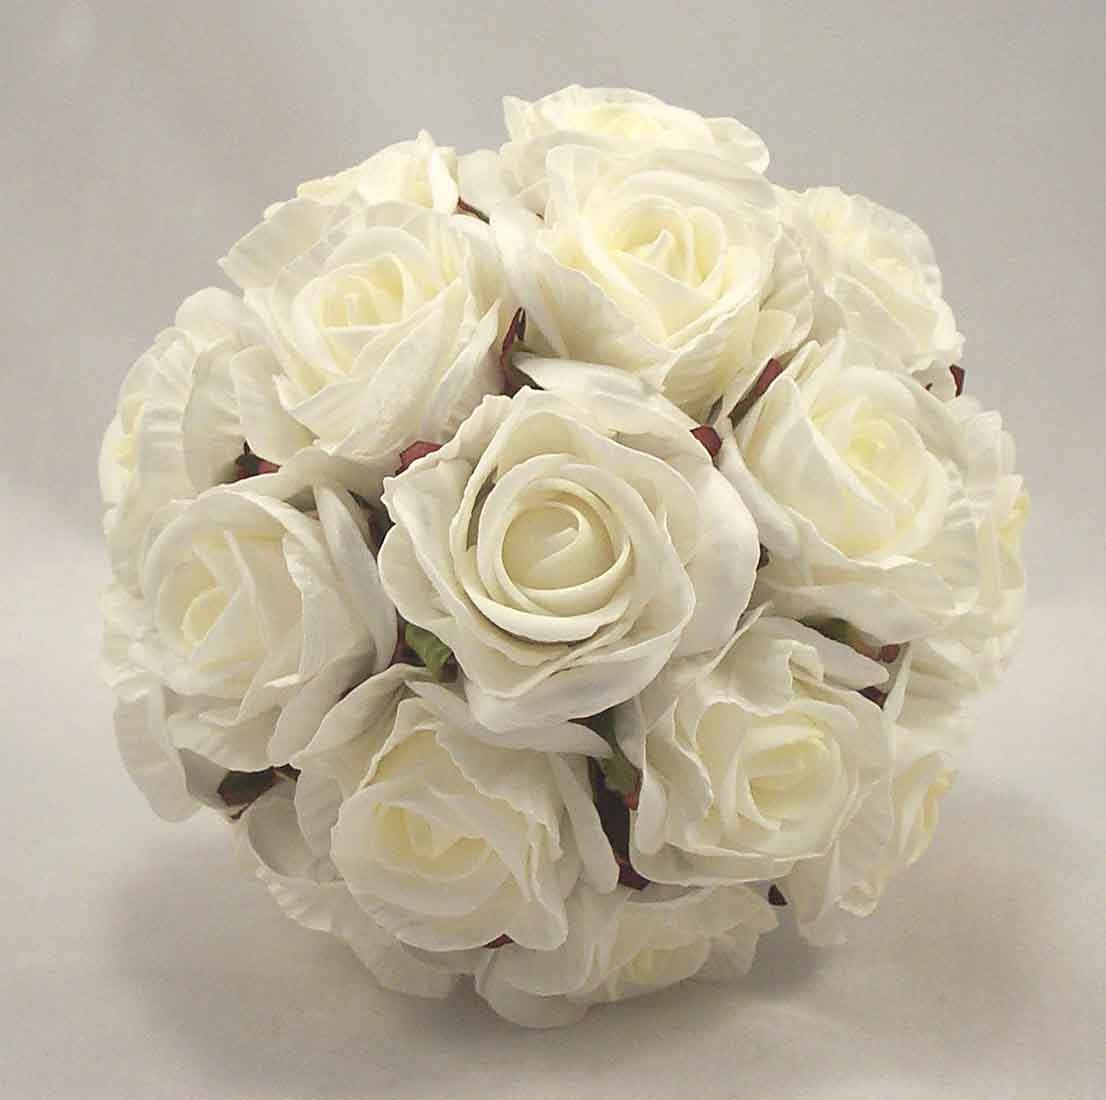 Crimped Ivory Rose Bridesmaid's Bouquet